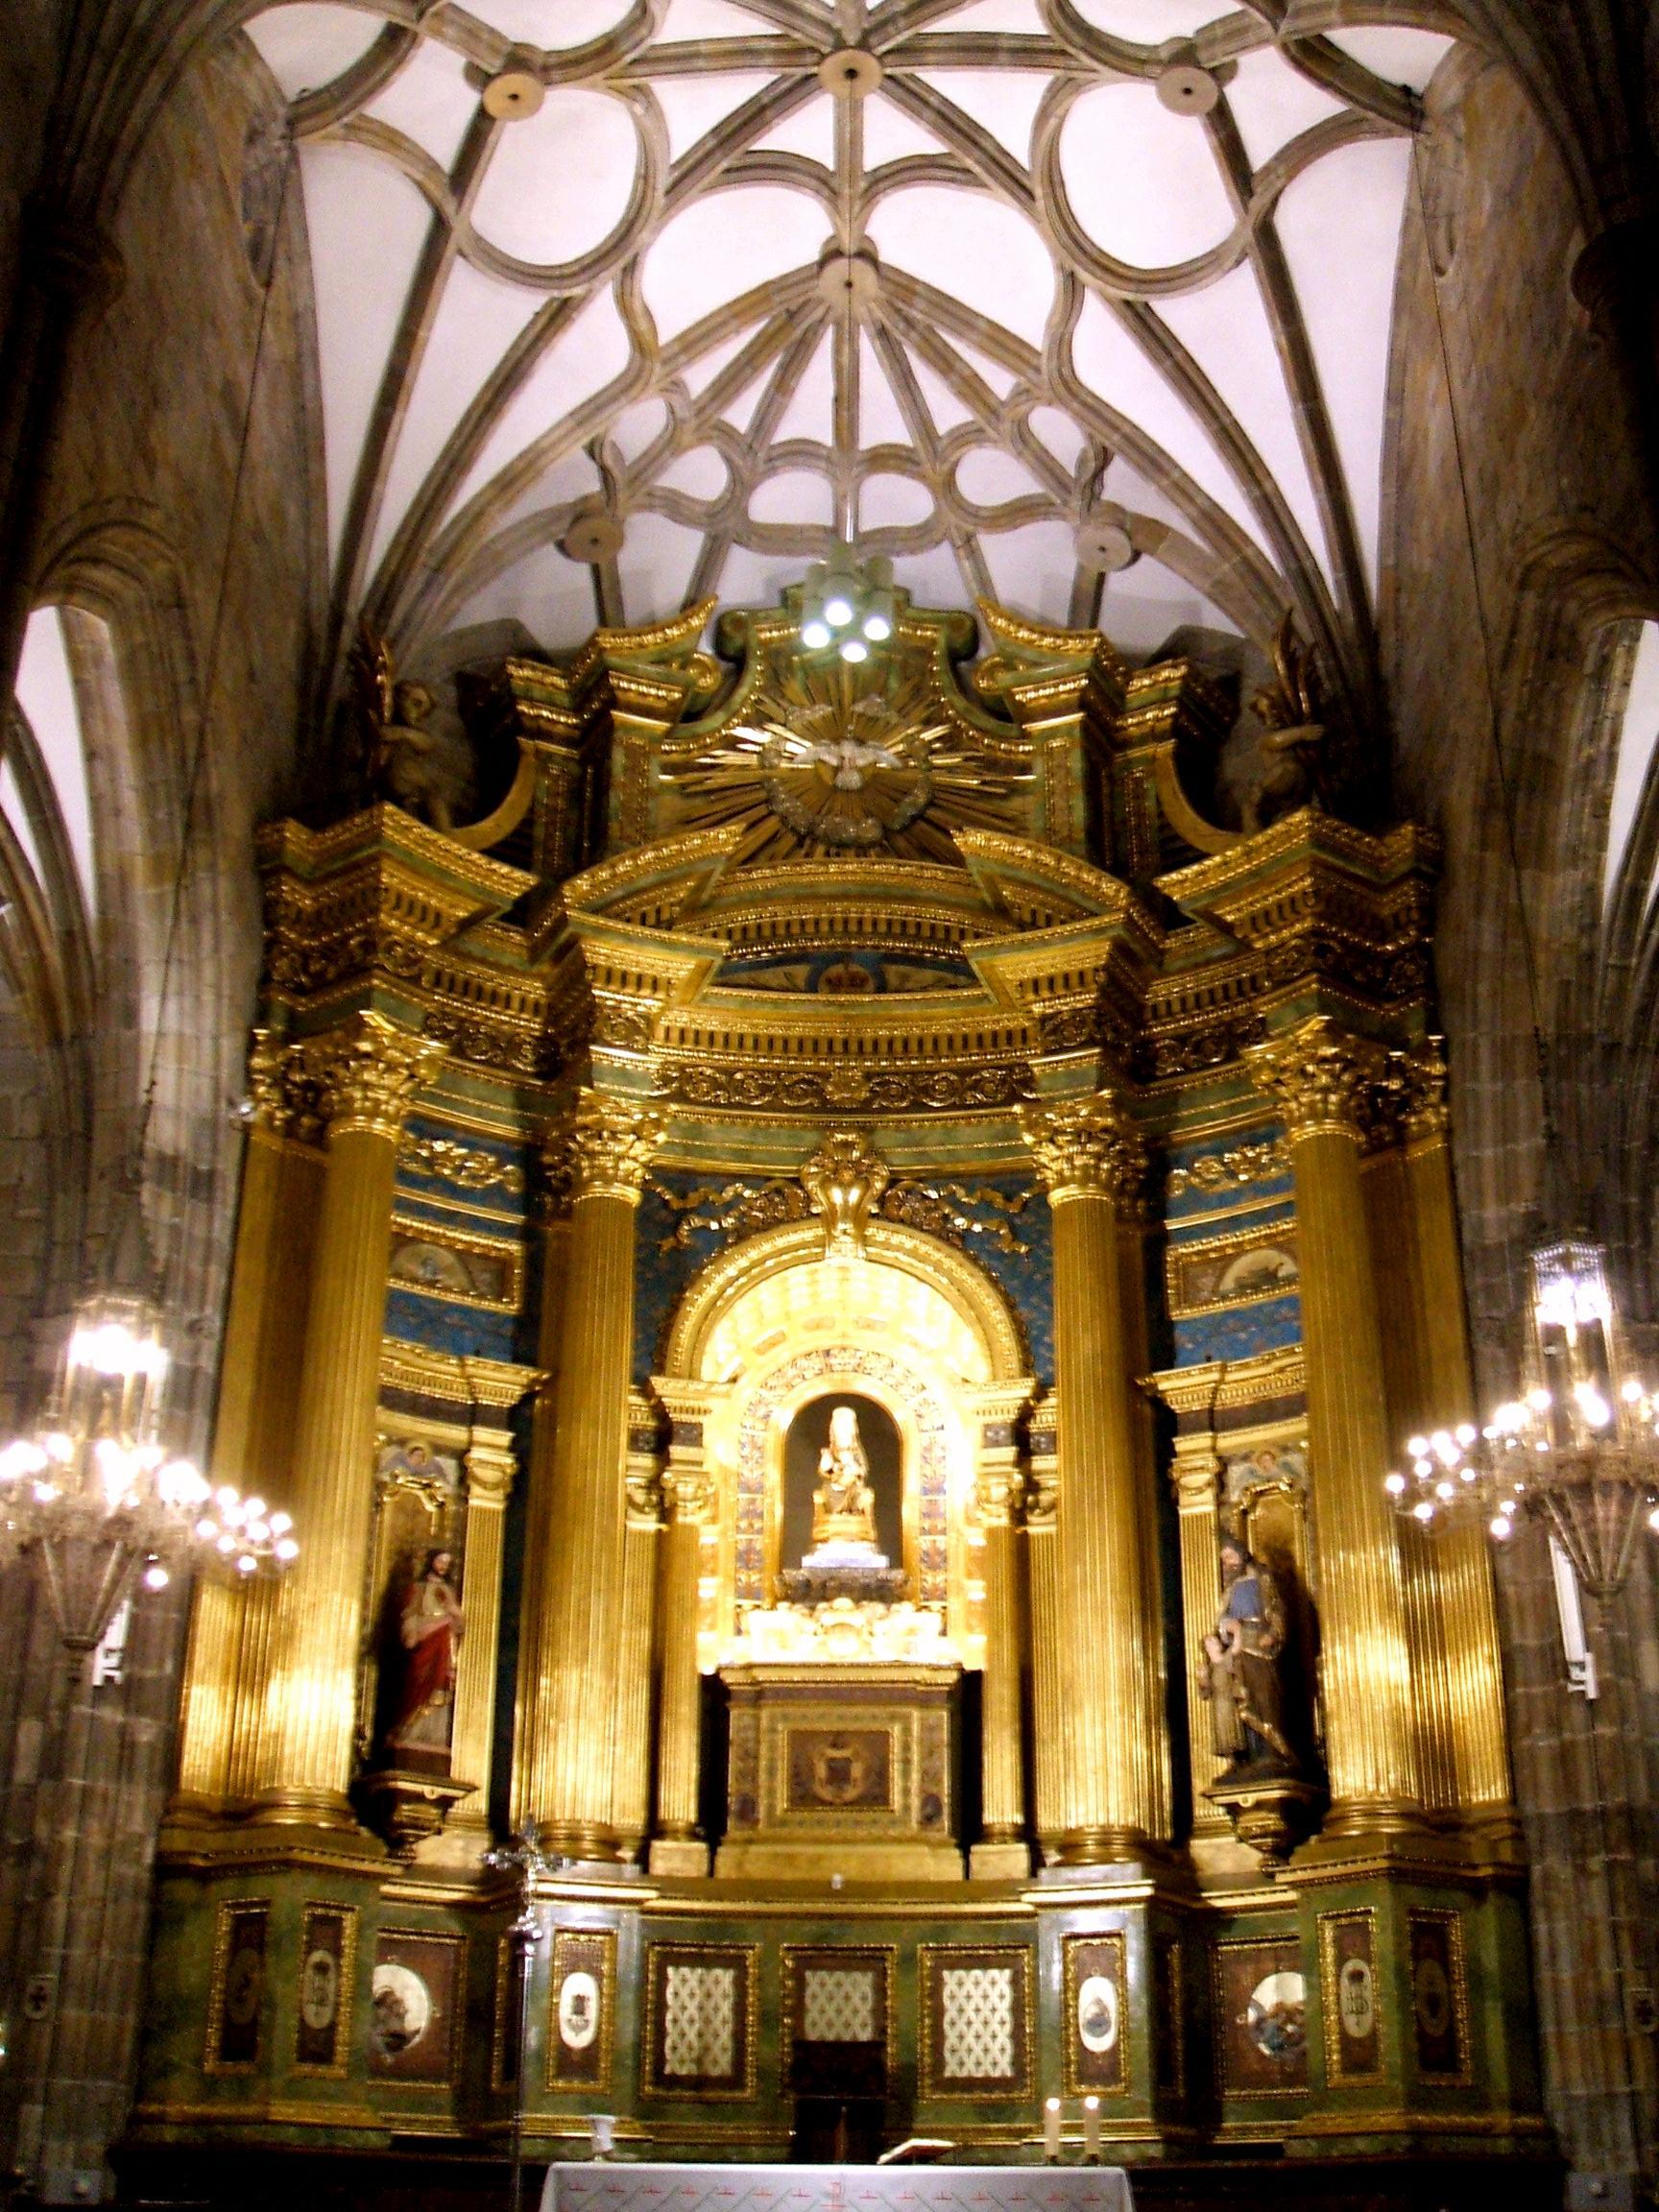 File:Bilbao - Basilica de Begoña 16.JPG - Wikimedia Commons